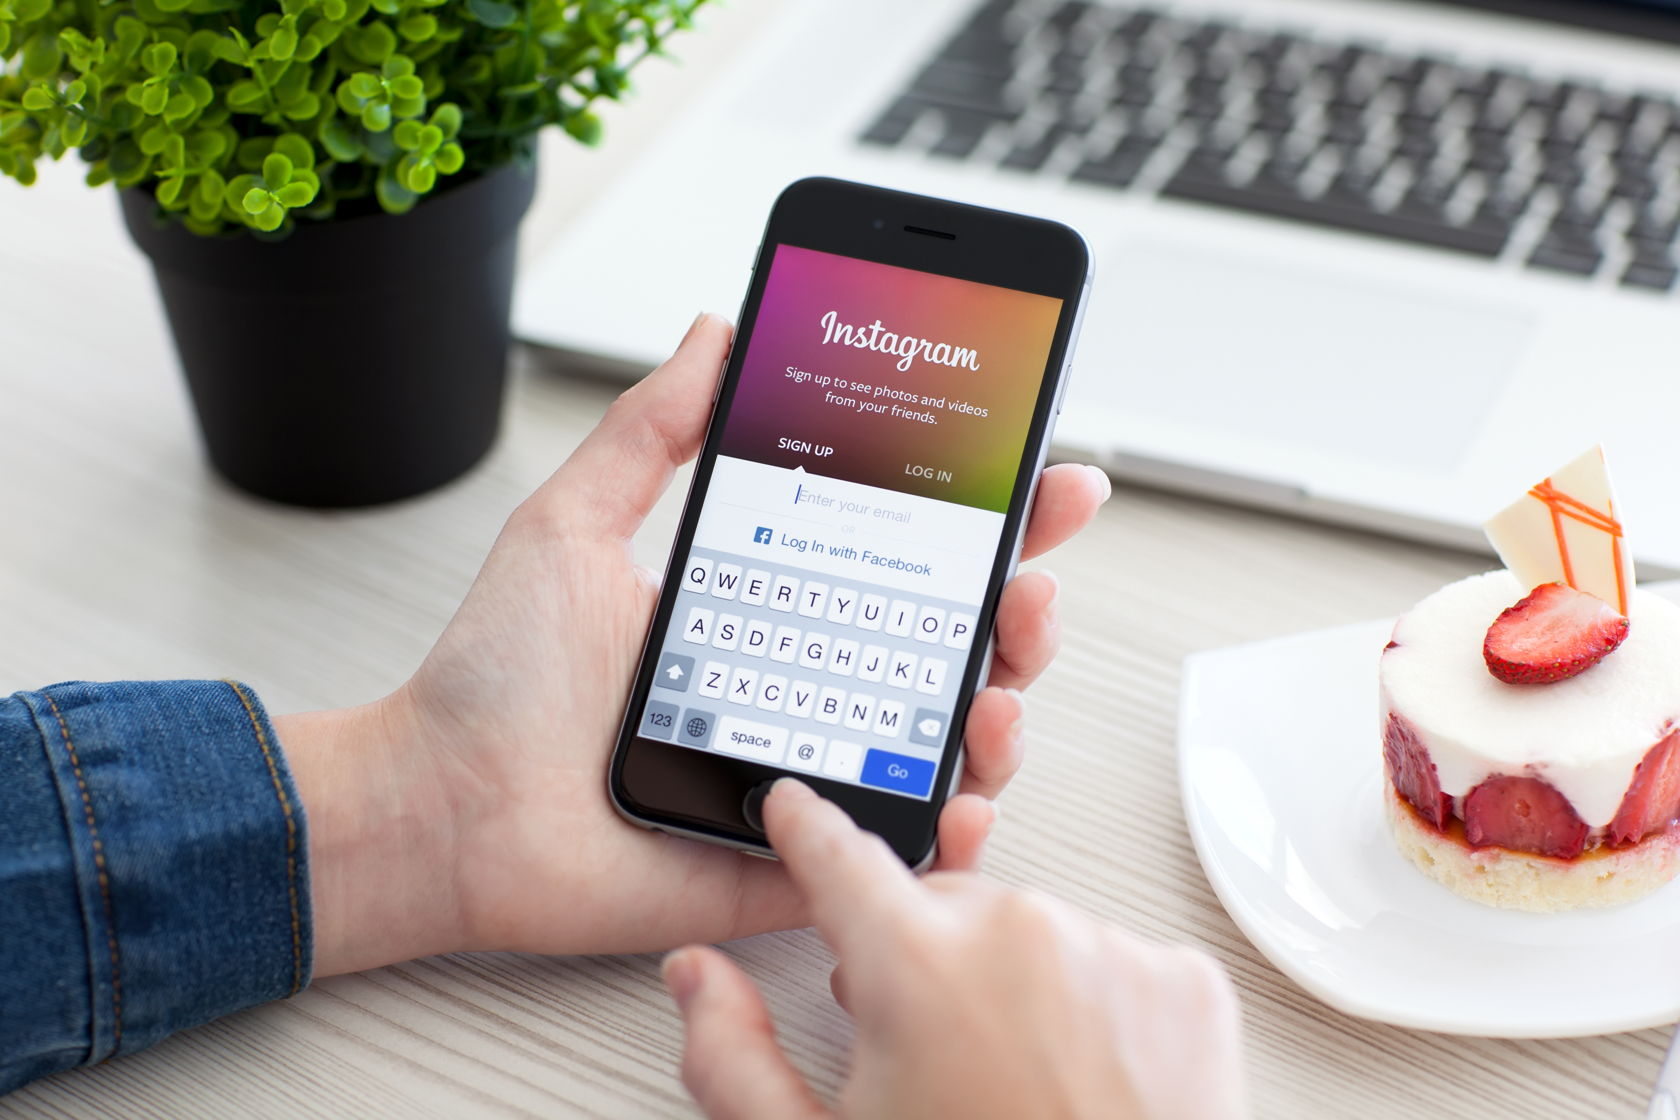 6 Руководство по настройке бизнес аккаунта Инстаграм.